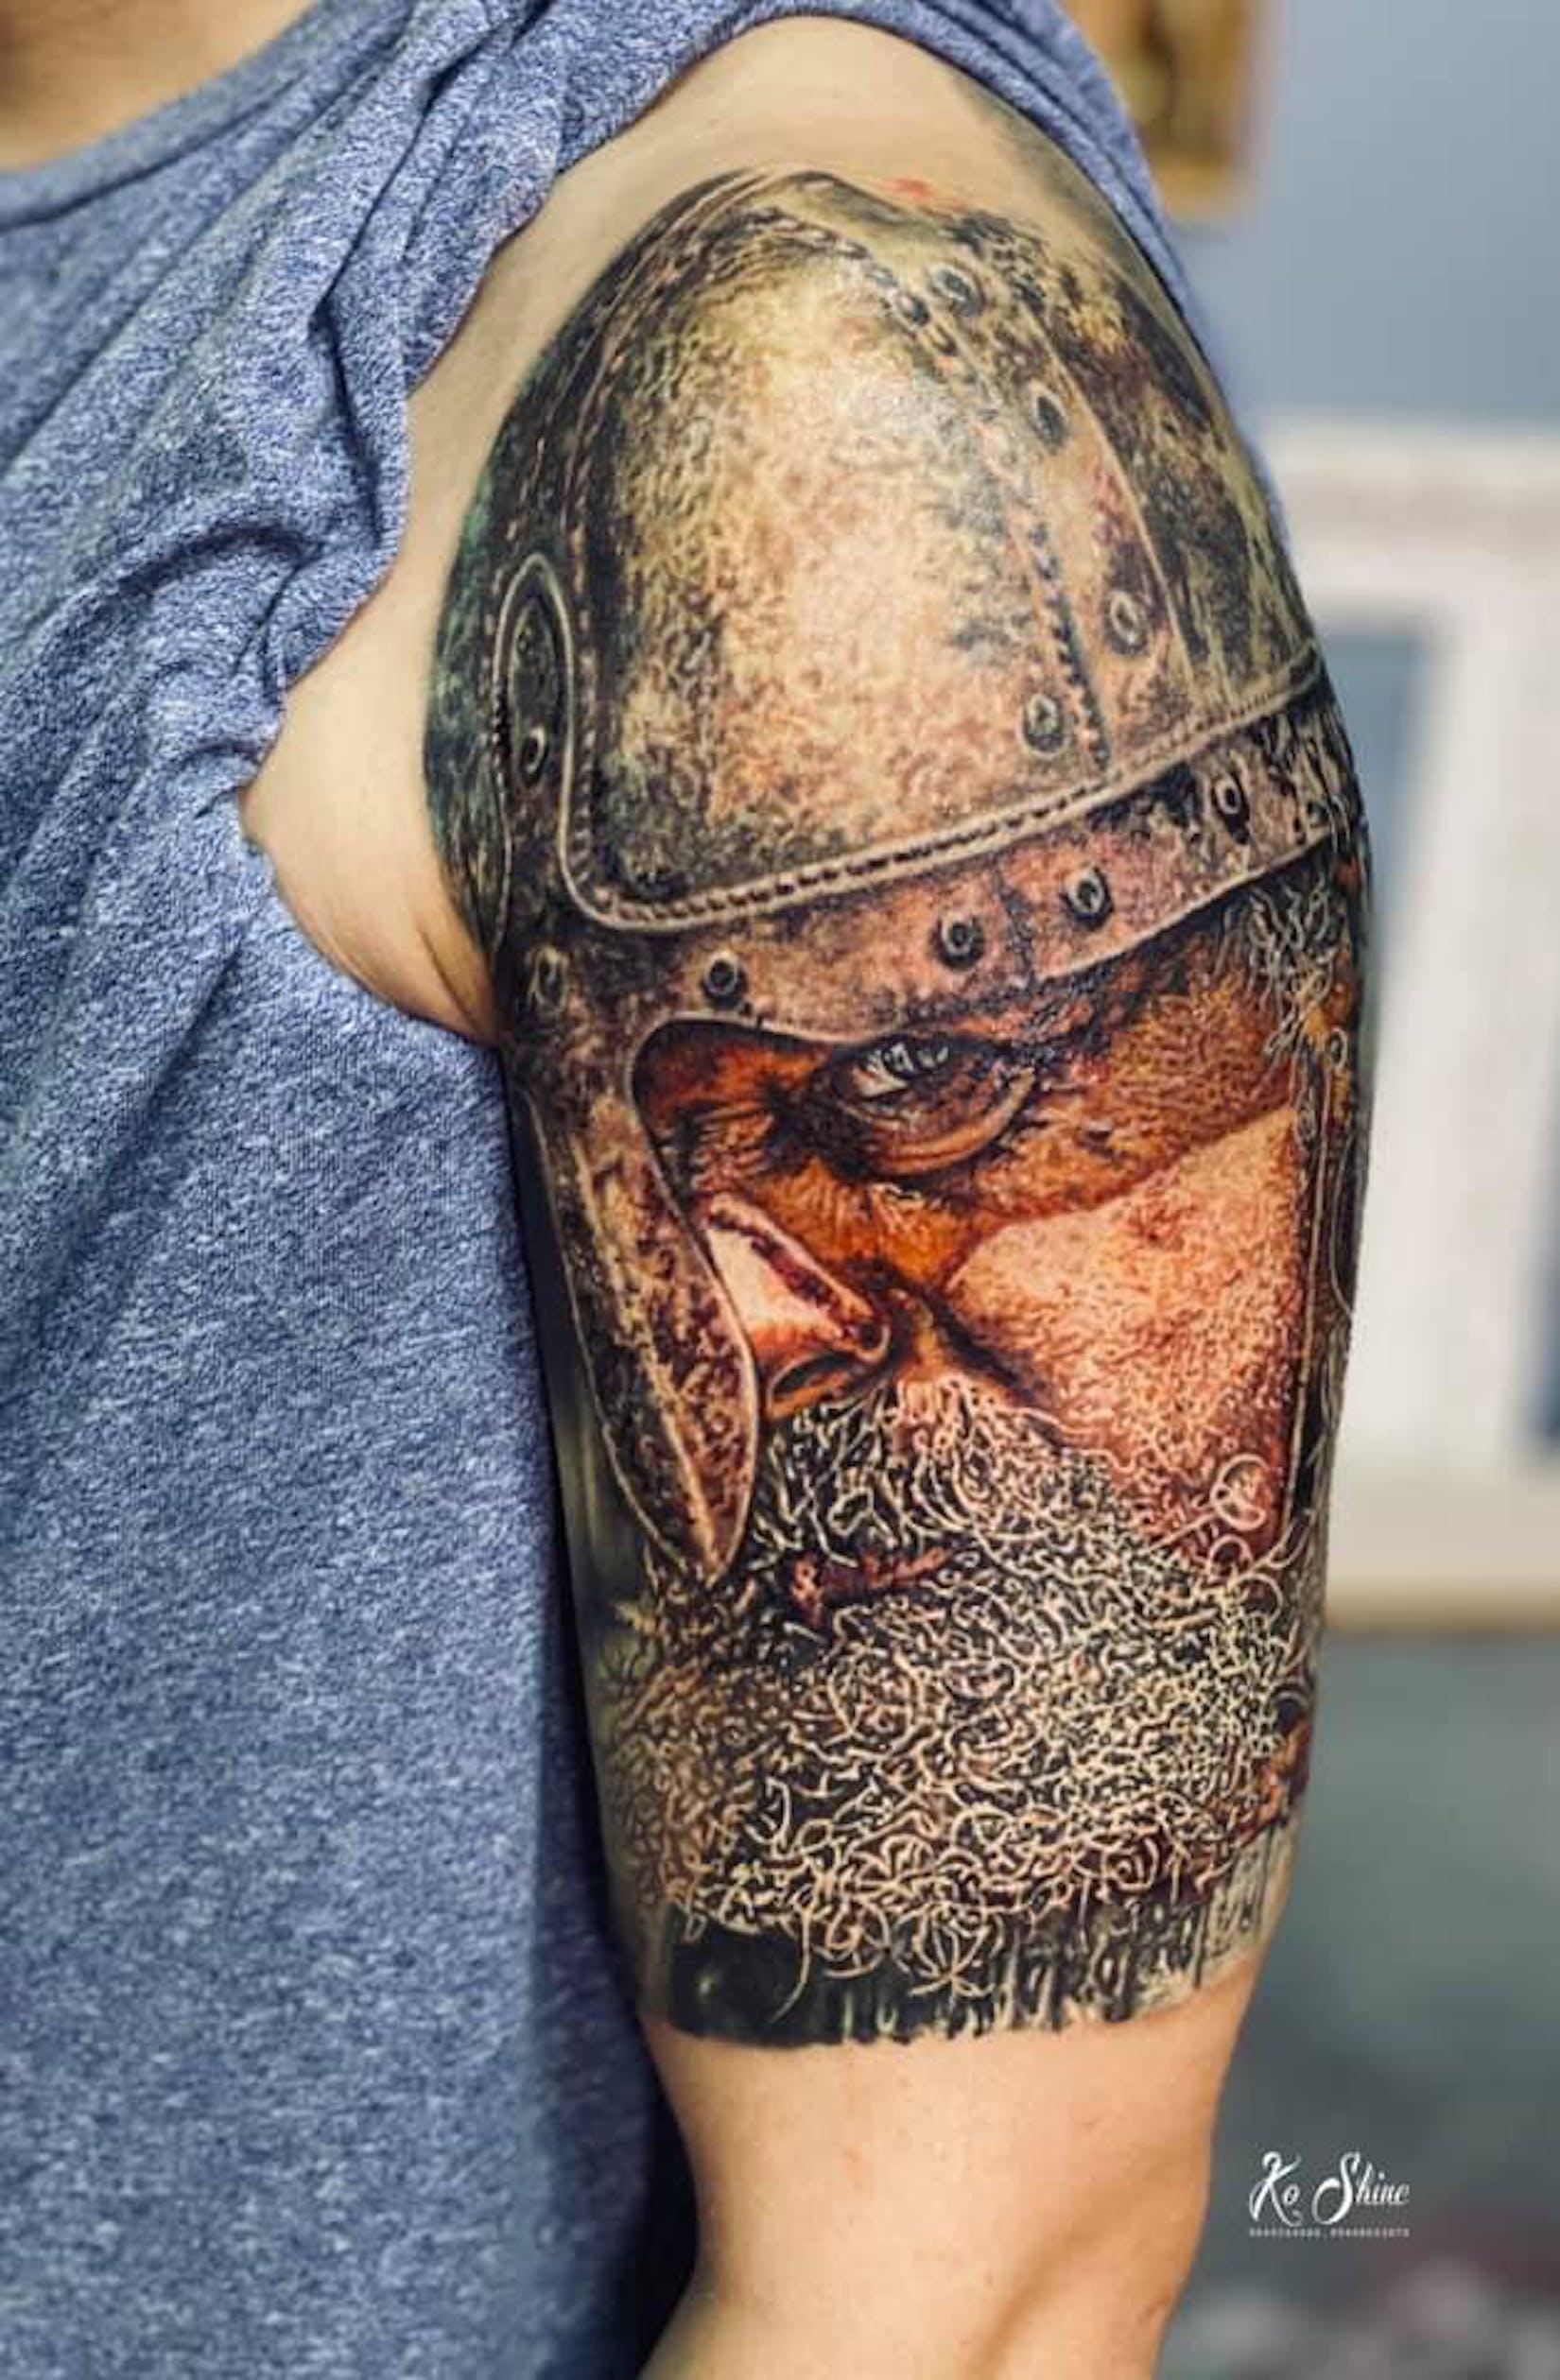 Ko Shine Tattooart | Beauty